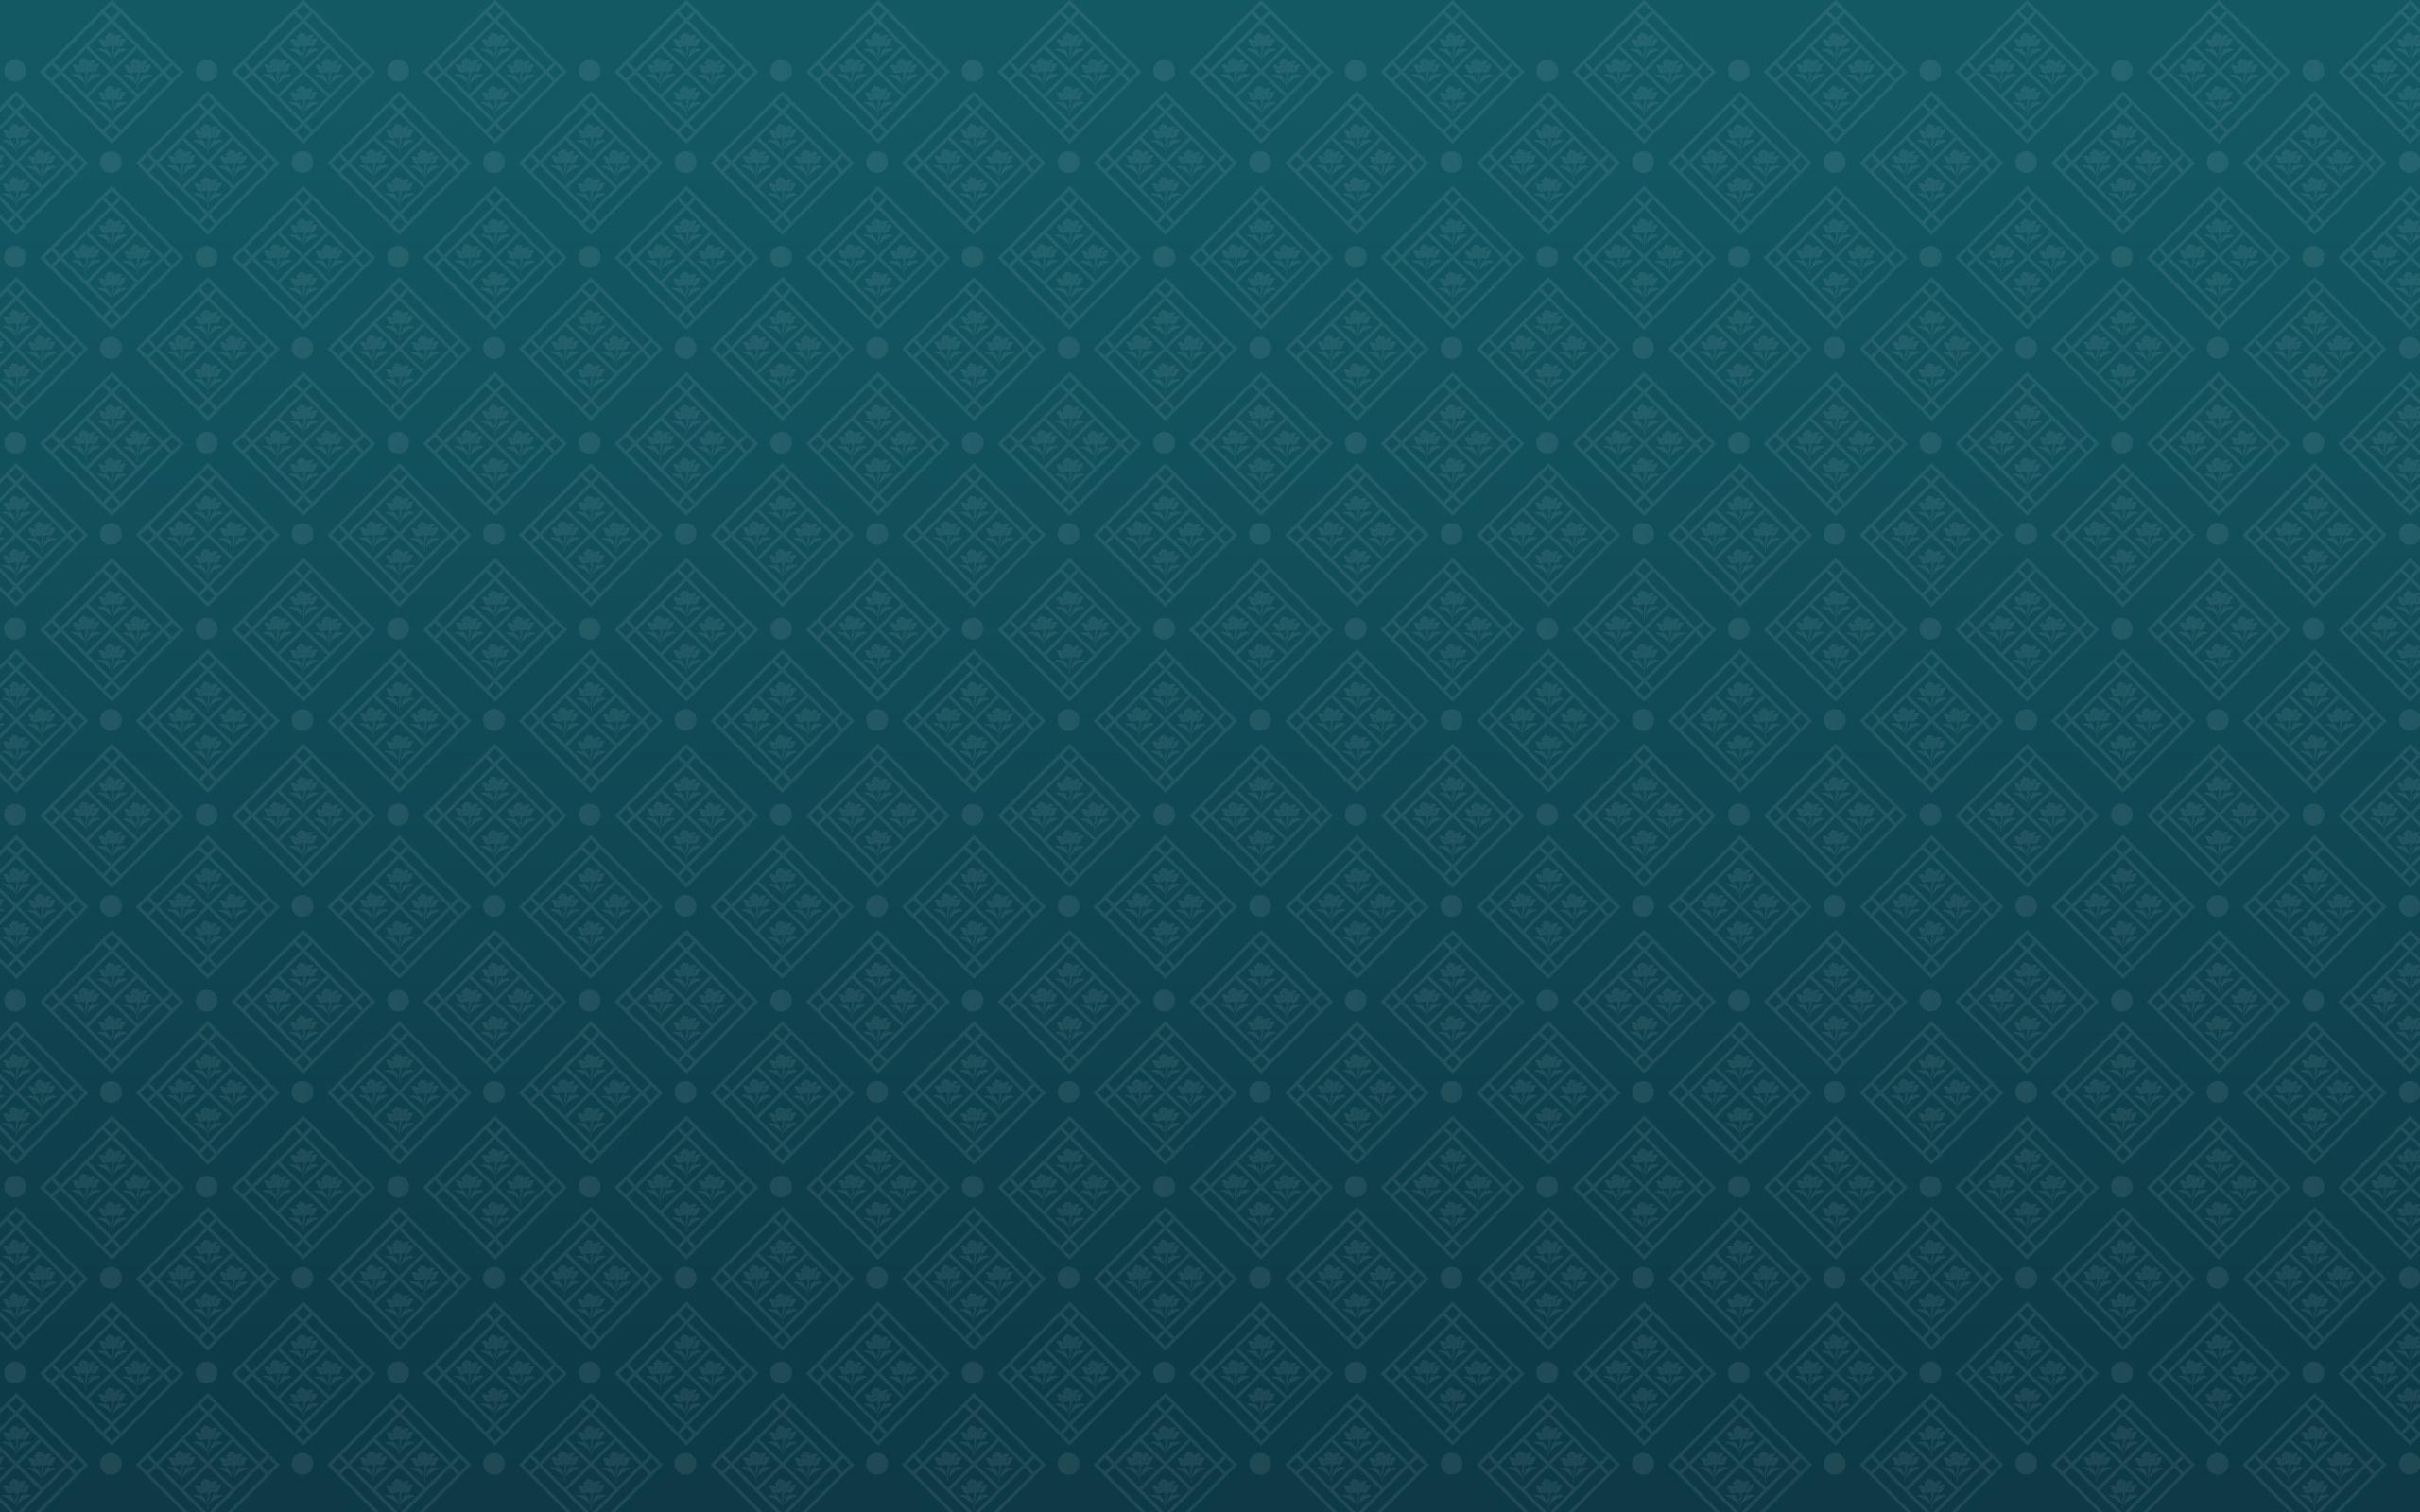 [Resim: pattern_texture1166kksyd.jpg]